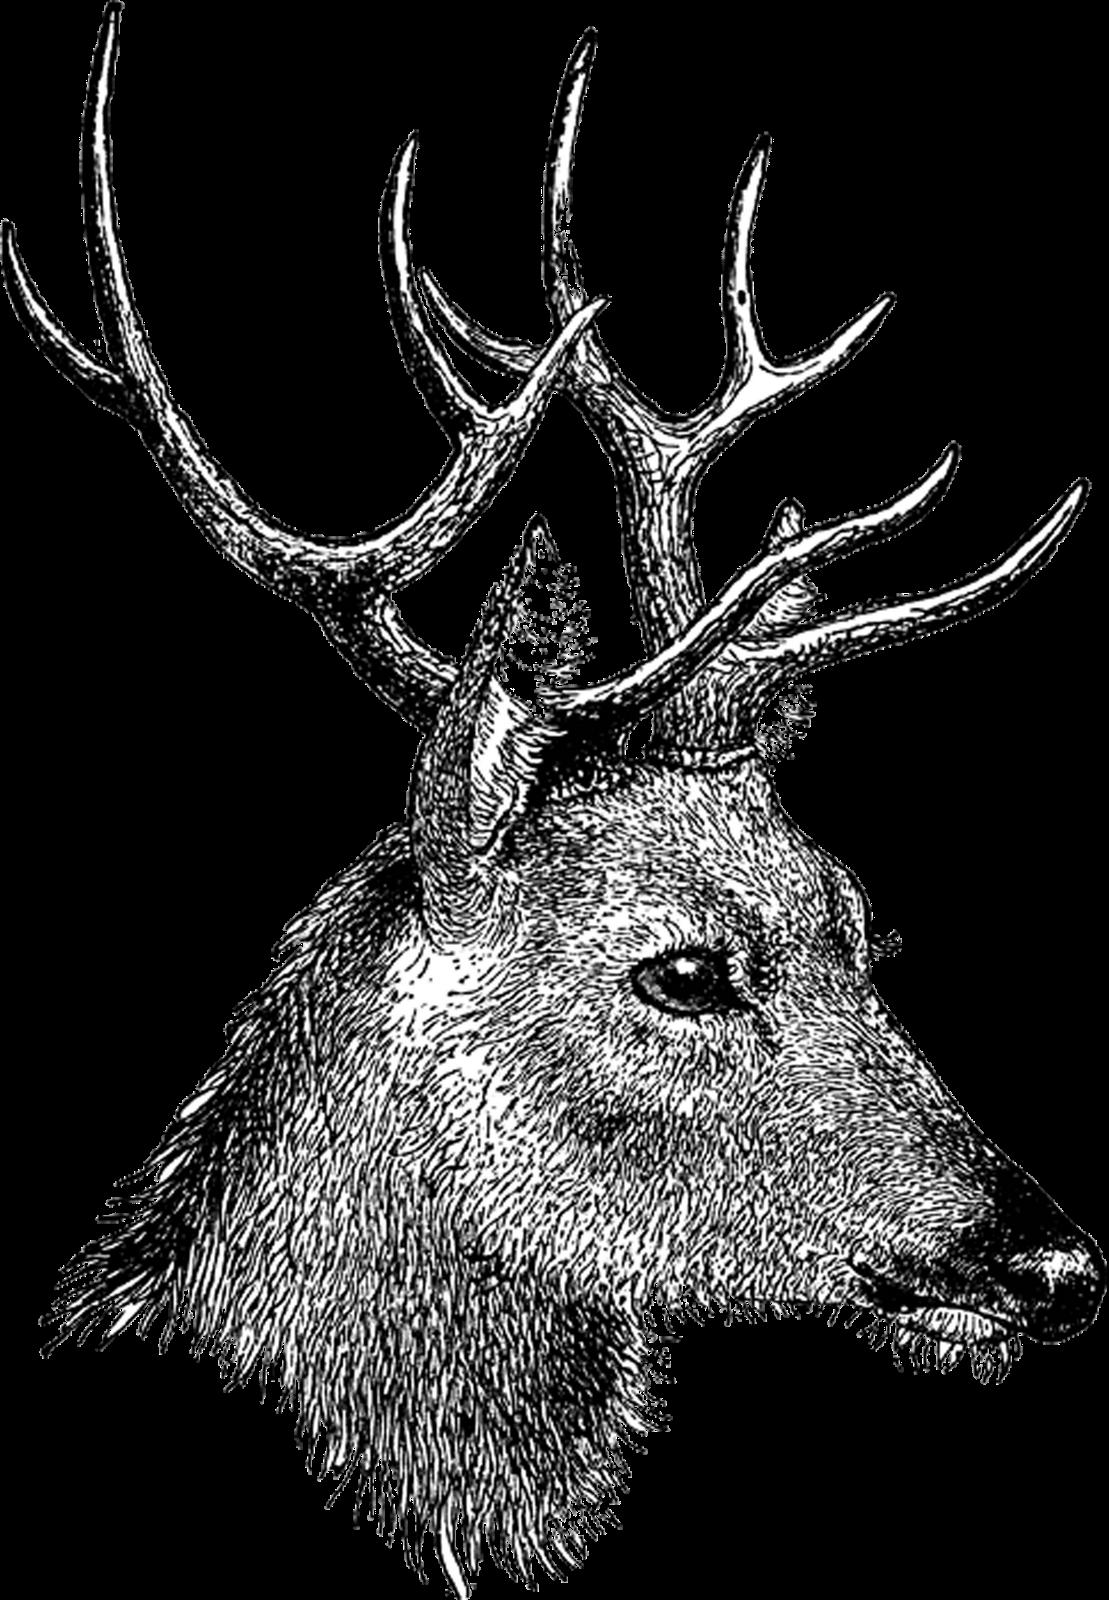 Free Vintage Digi Stamp Deer Head Png 1 109 1 600 Pixels Clip Art Vintage Digital Stamps Vintage Printables